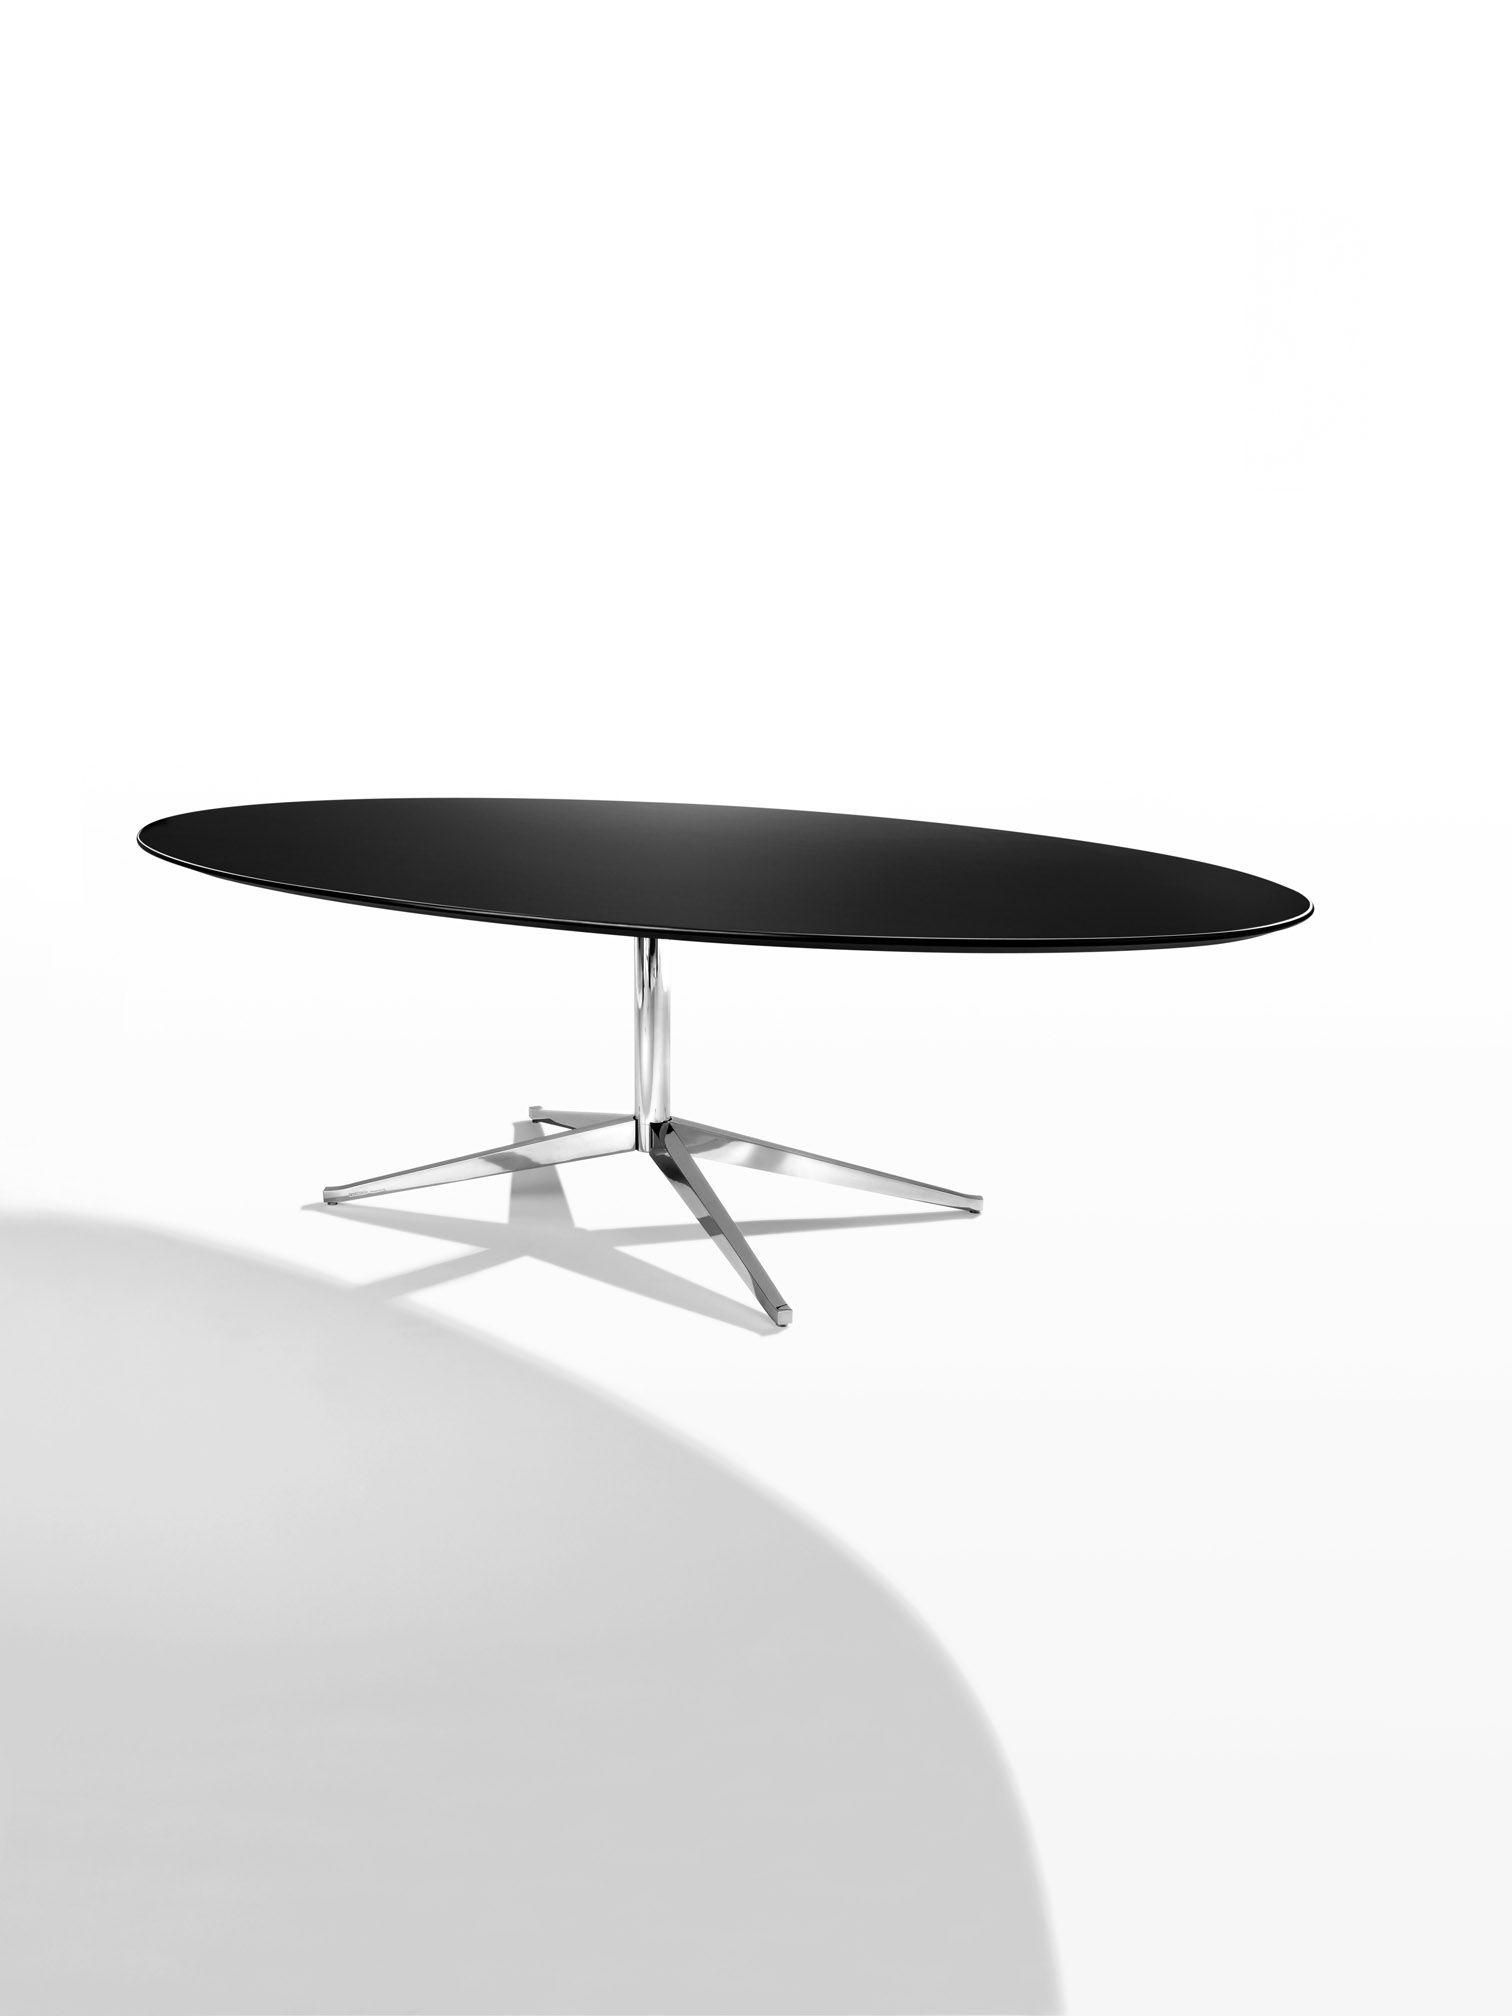 Table Florence Knoll Prix knoll florence - oval table desk | florence knoll table